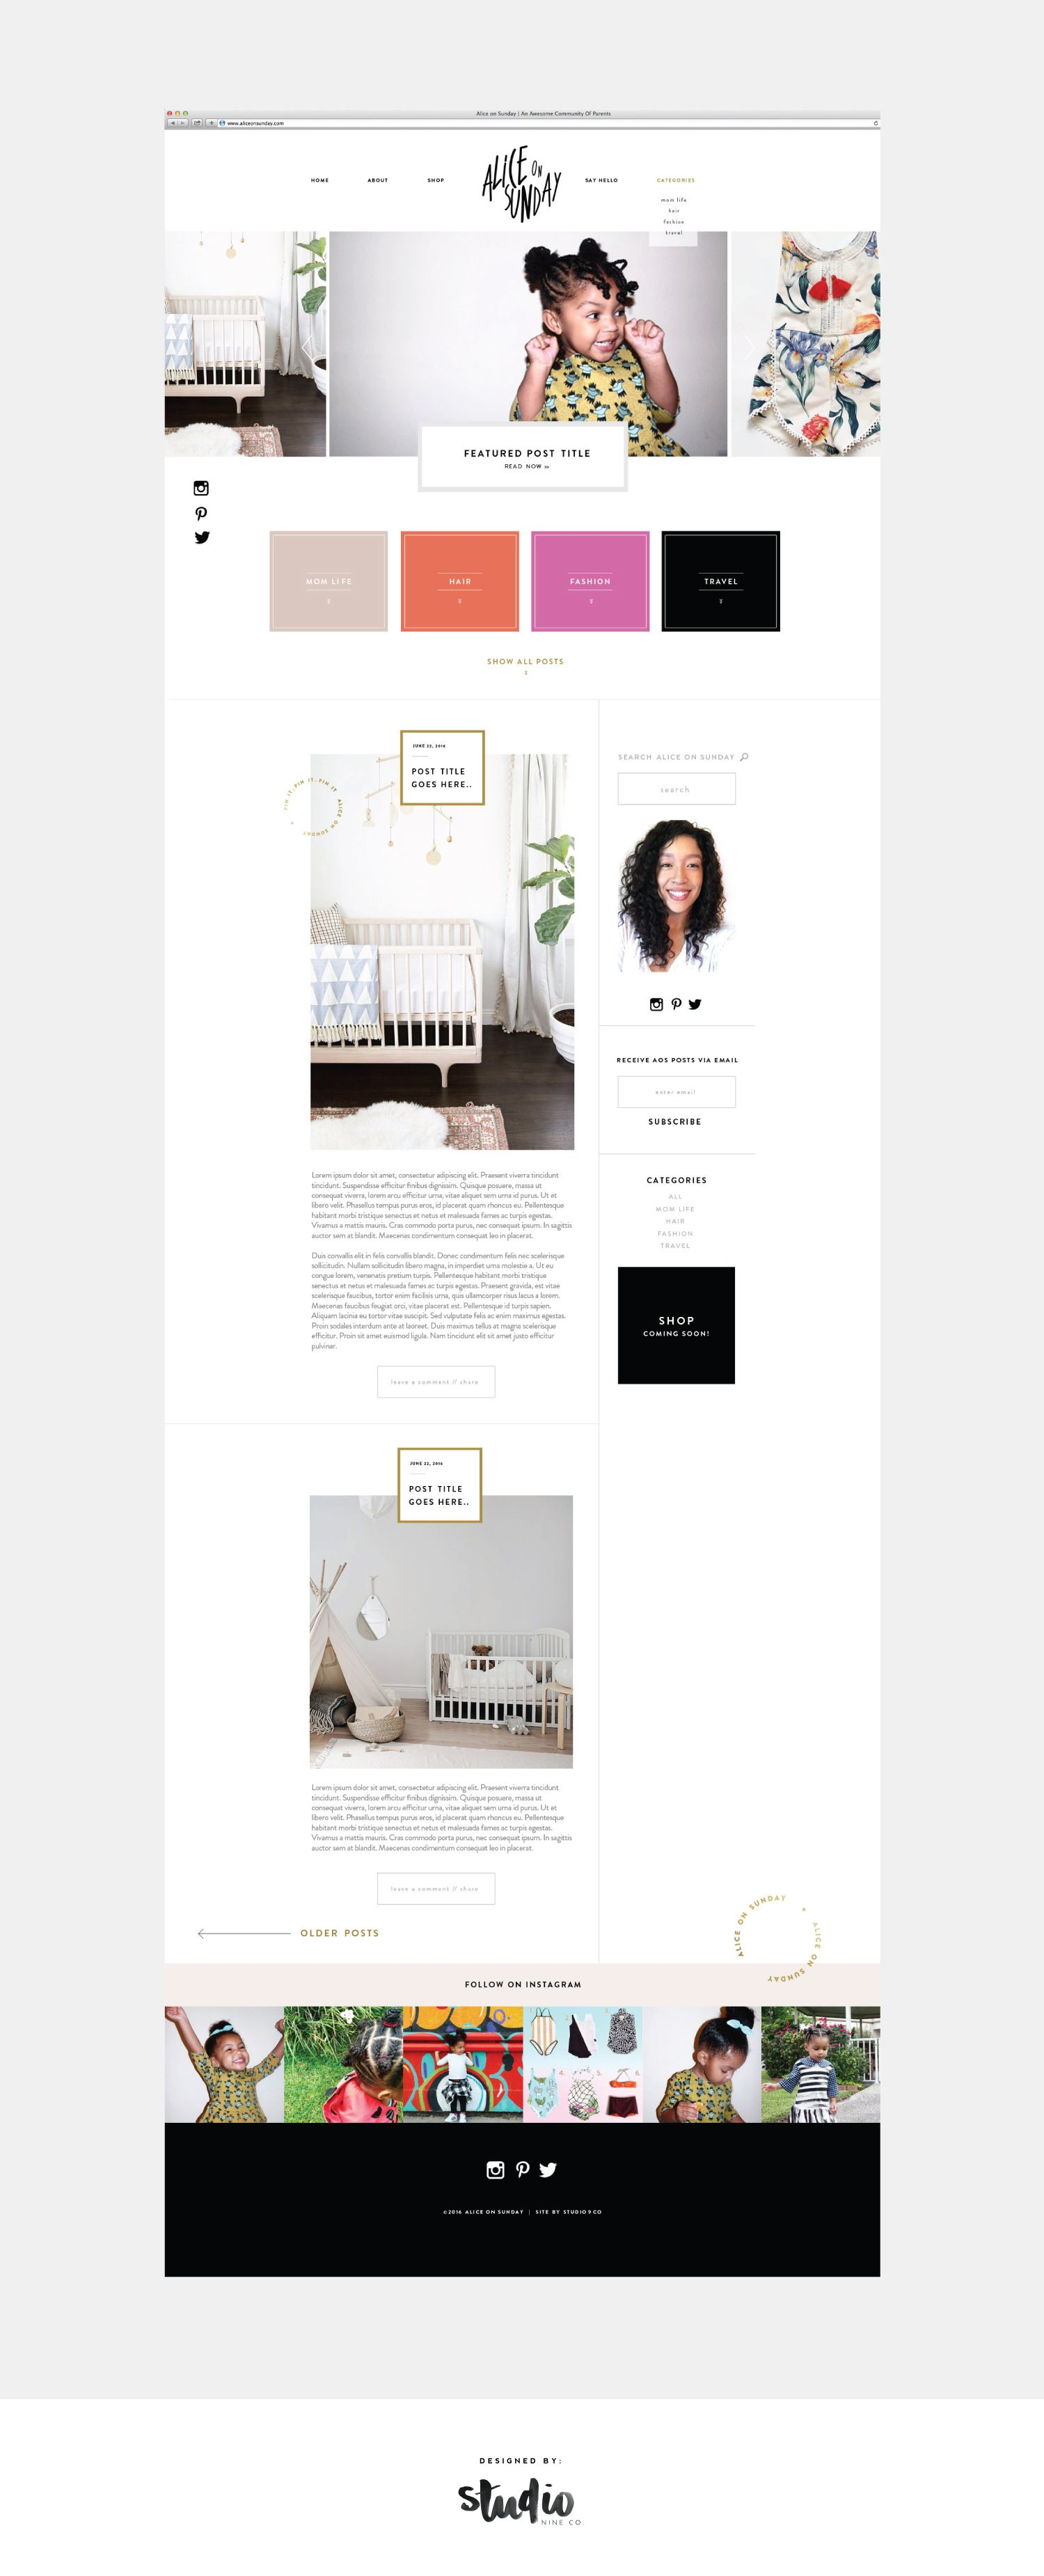 Alice On Sunday By Studio 9 Co Photographer Branding Design Web Design Web Design Inspiration